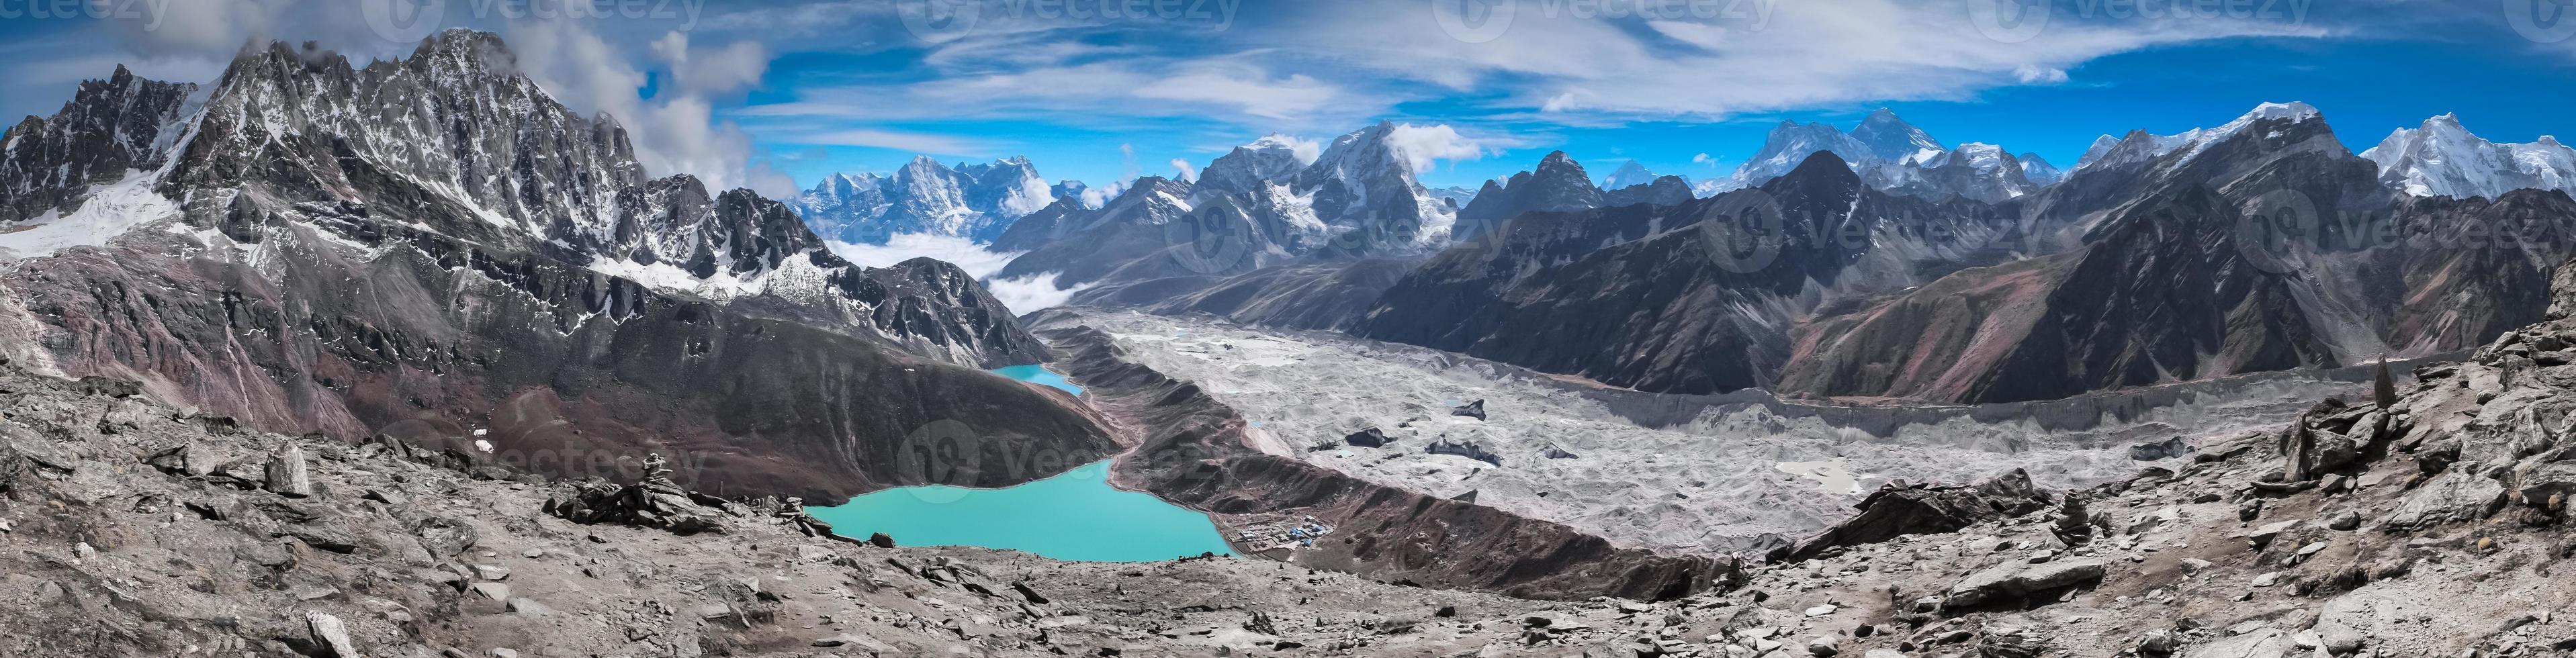 hermosas montañas nevadas con lago foto